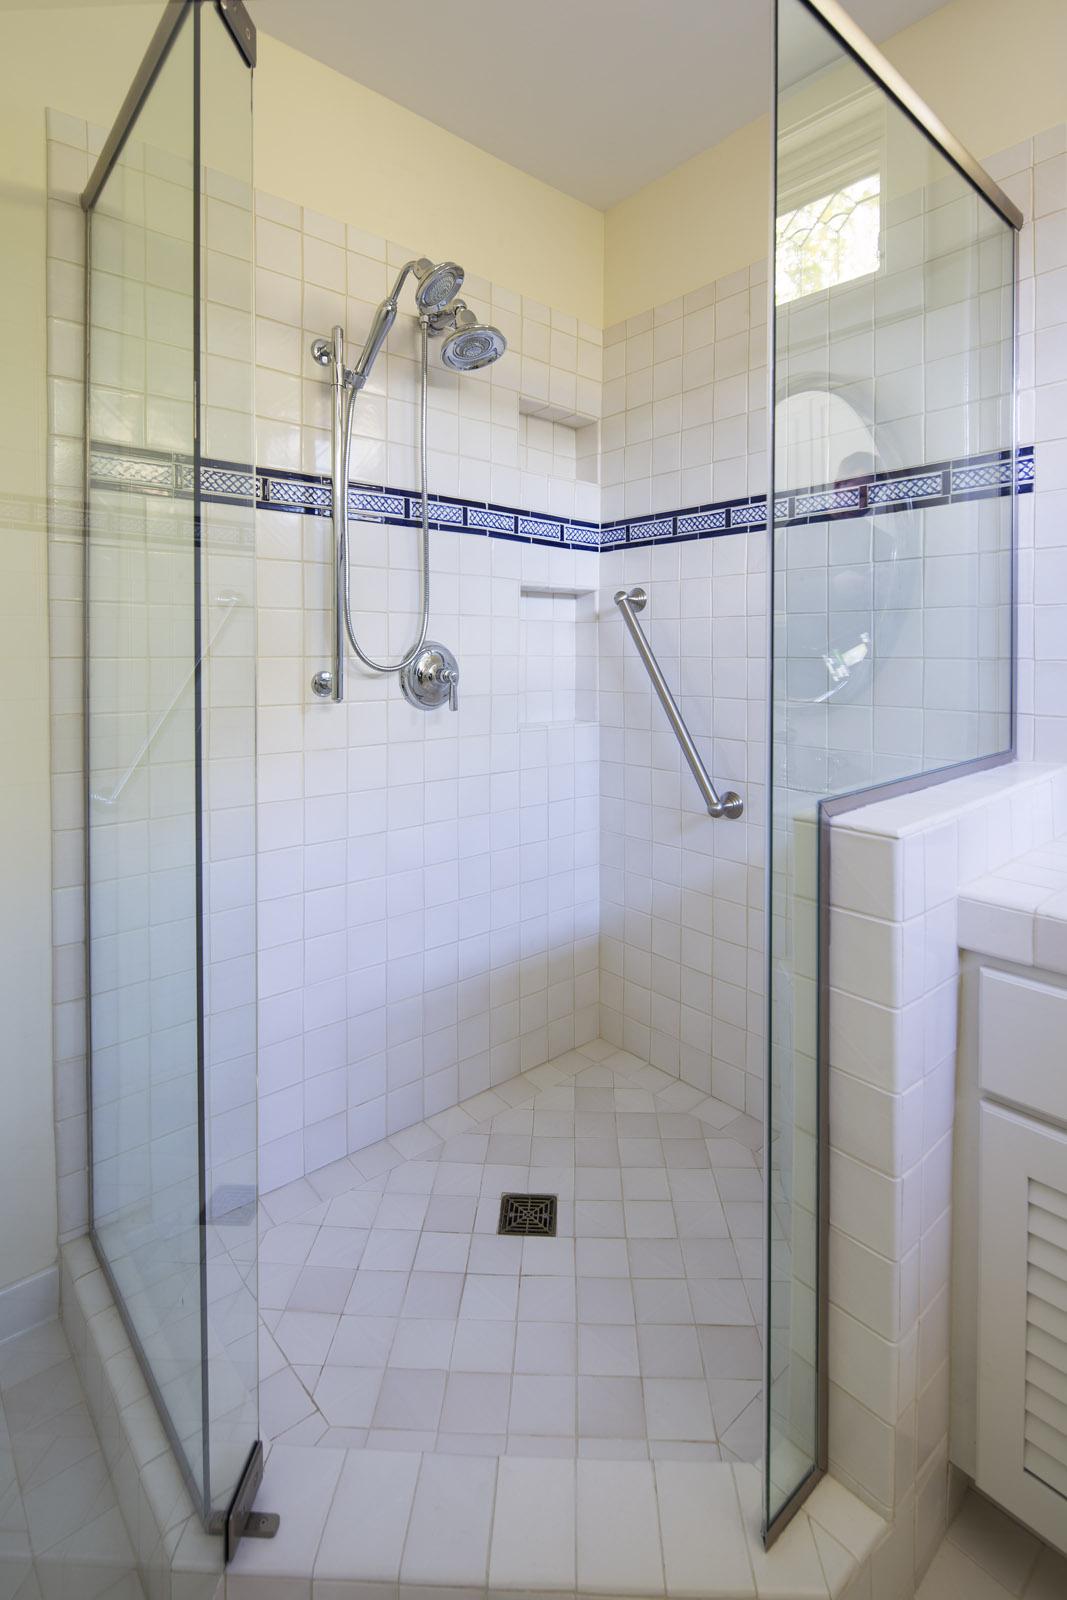 Cheeseman | Bathroom Remodel | After #3